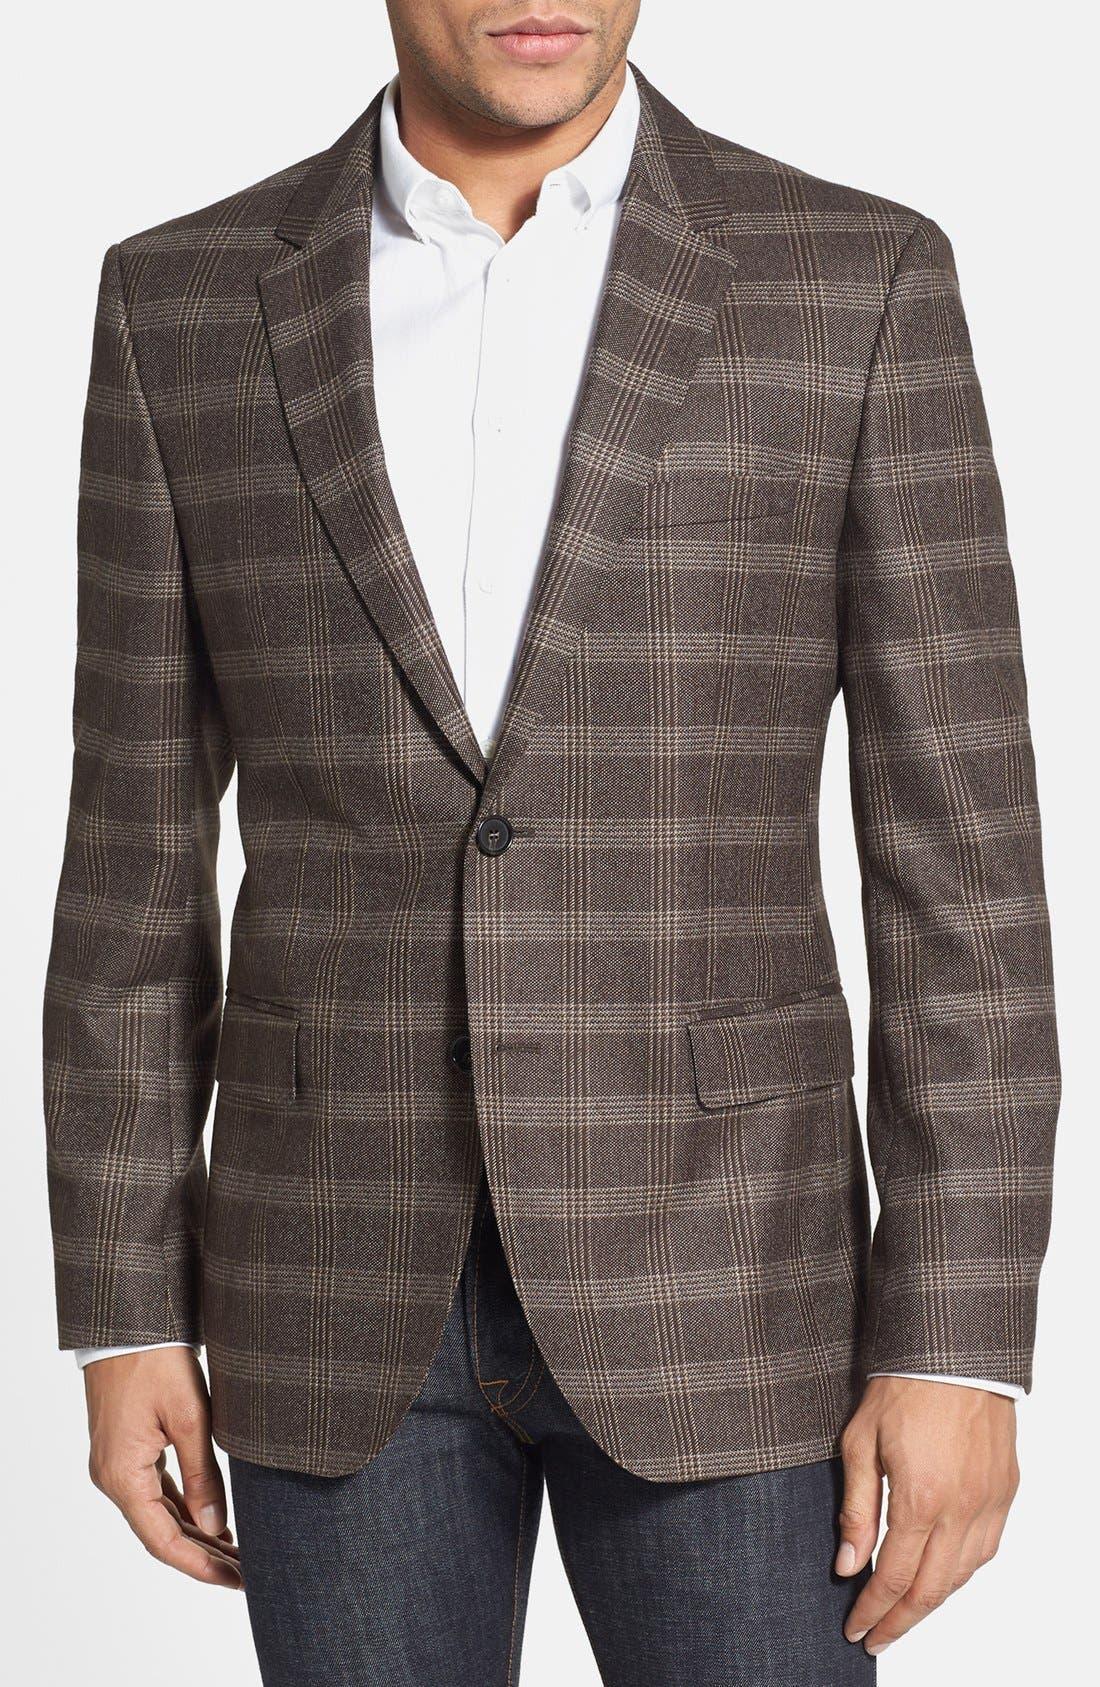 Alternate Image 1 Selected - BOSS HUGO BOSS 'The James' Trim Fit Plaid Sportcoat